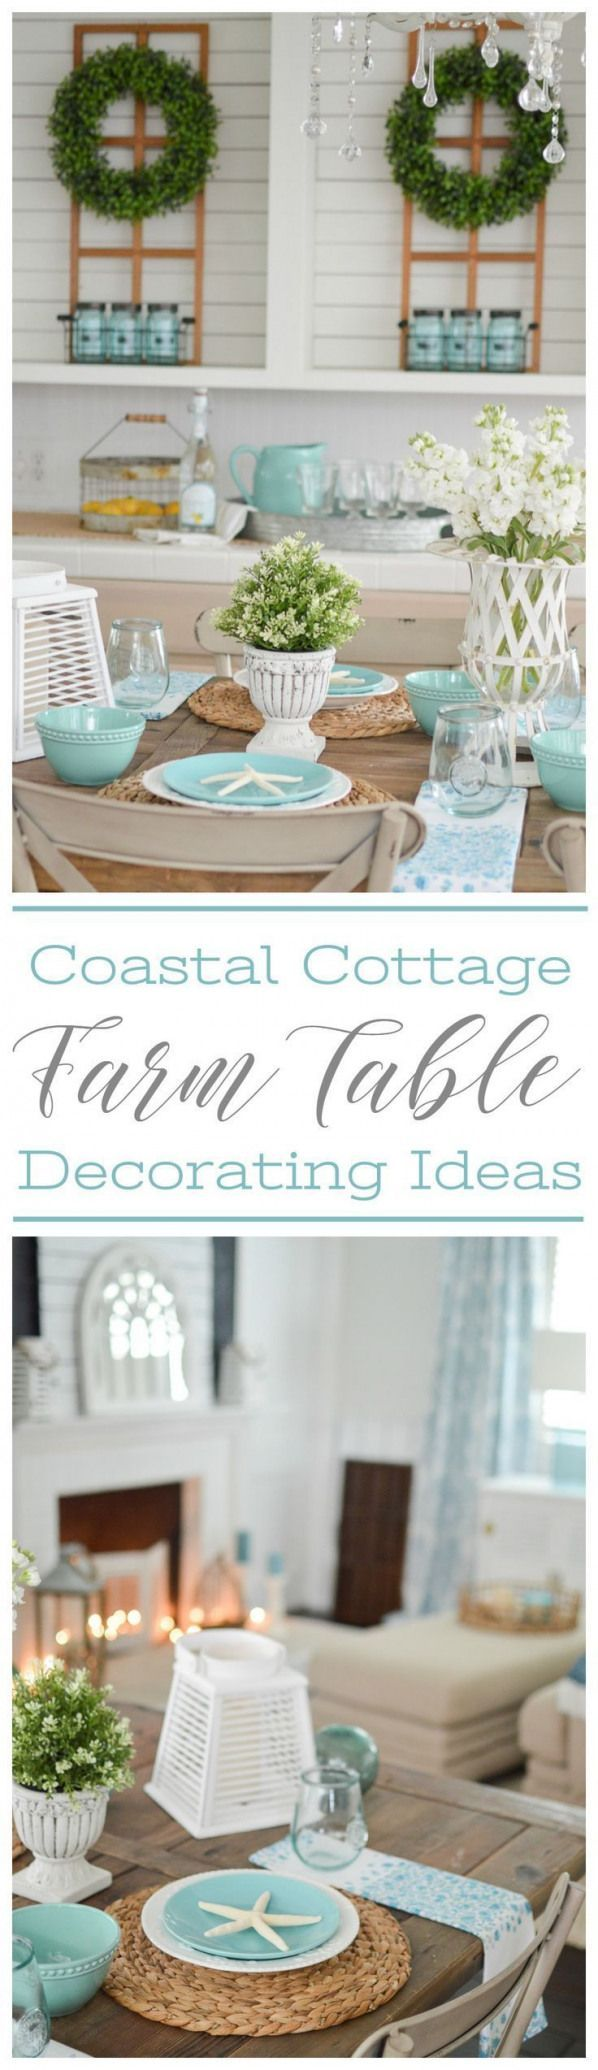 Easy  Affordable Coastal Cottage Farmhouse Style Farm Table Decorating Ideas iaffordable